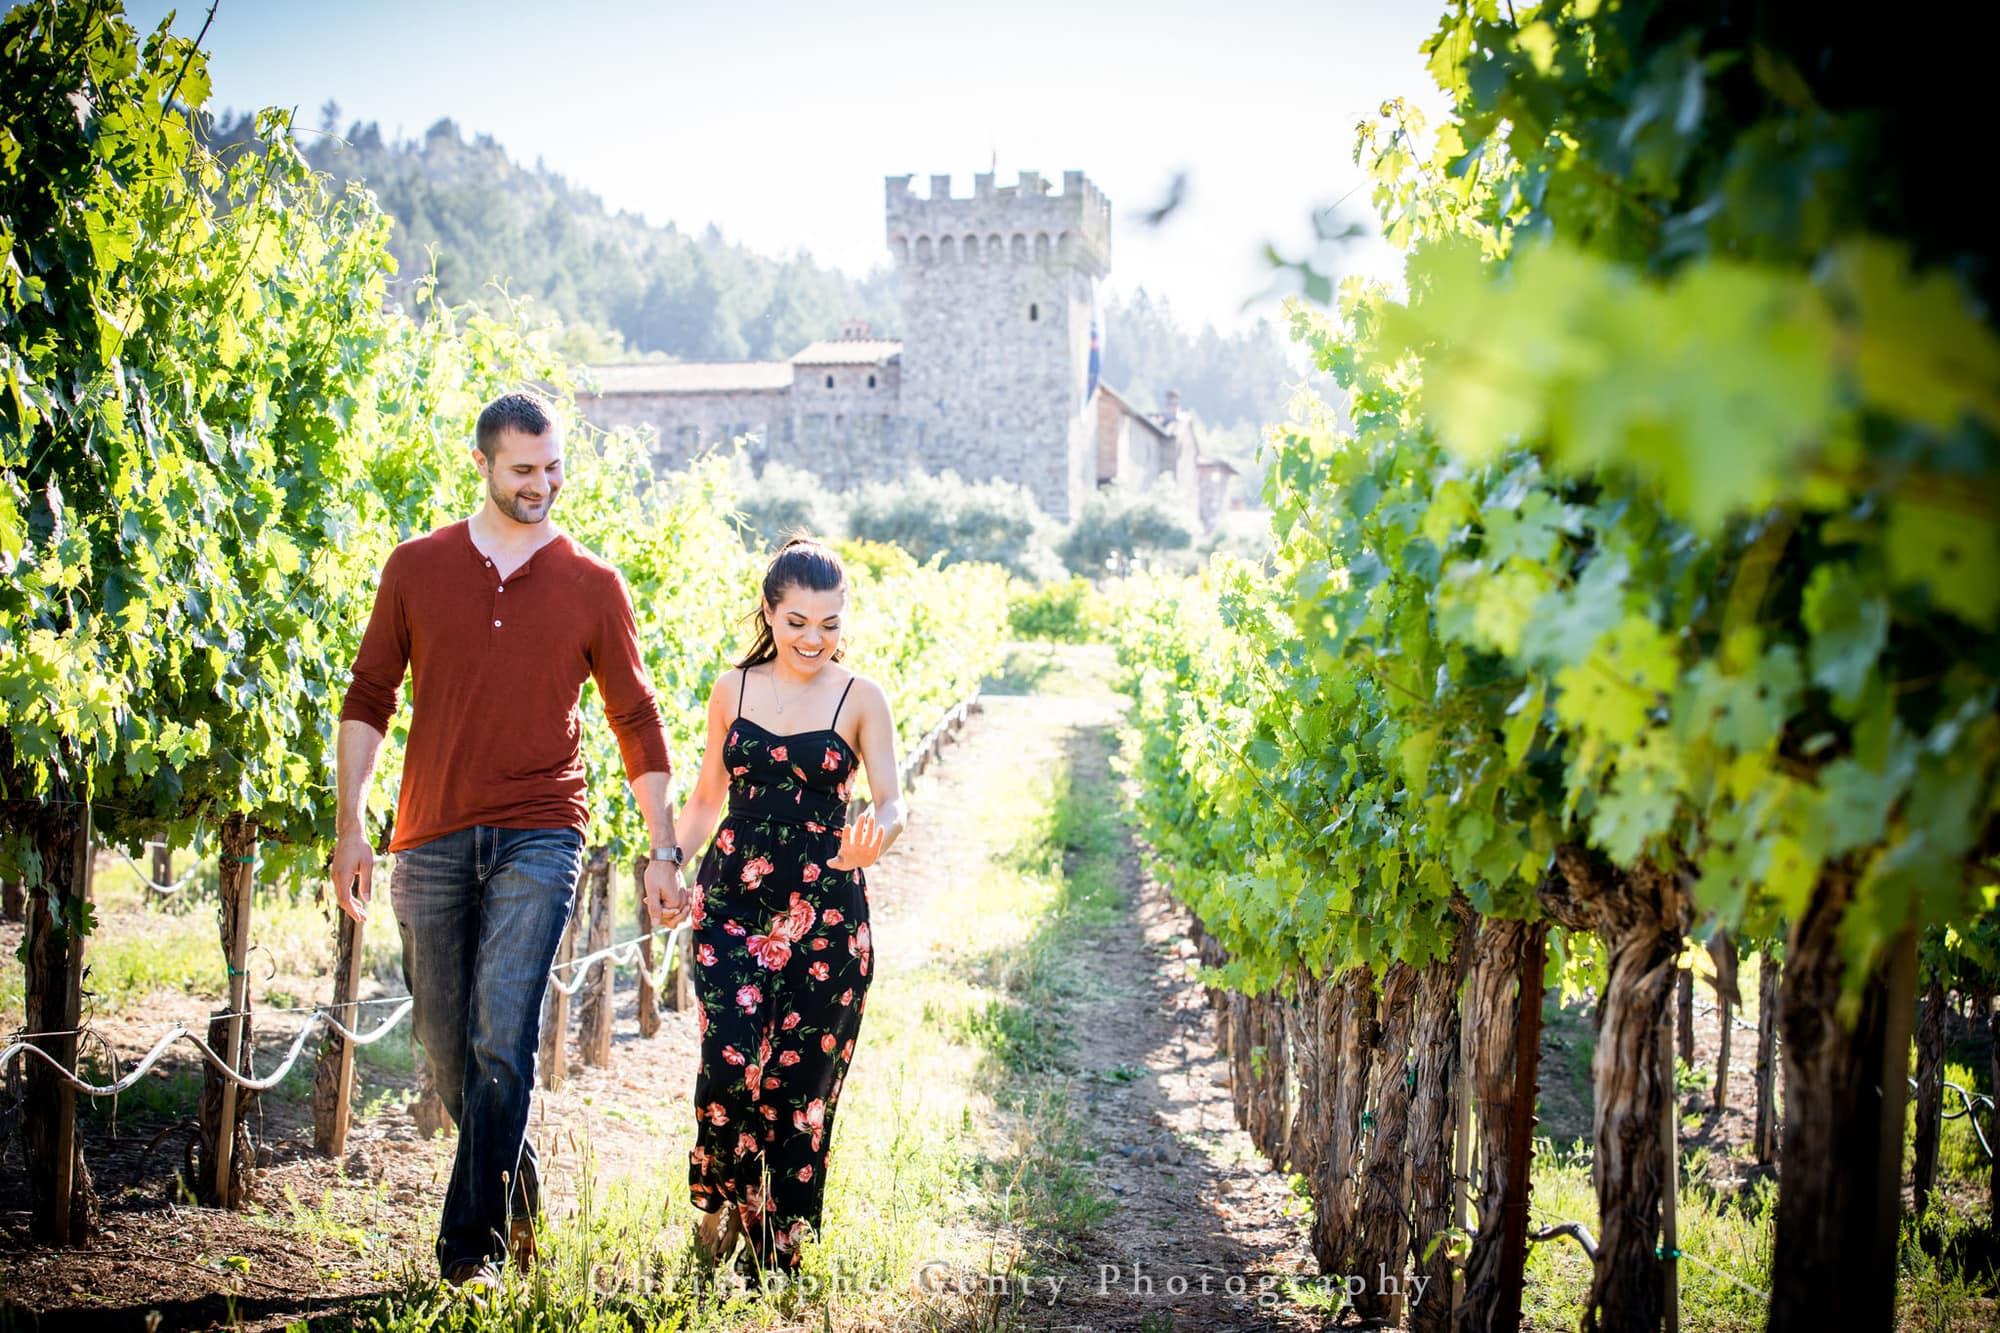 Castello di Amorosa Marriage Proposal Photography 308